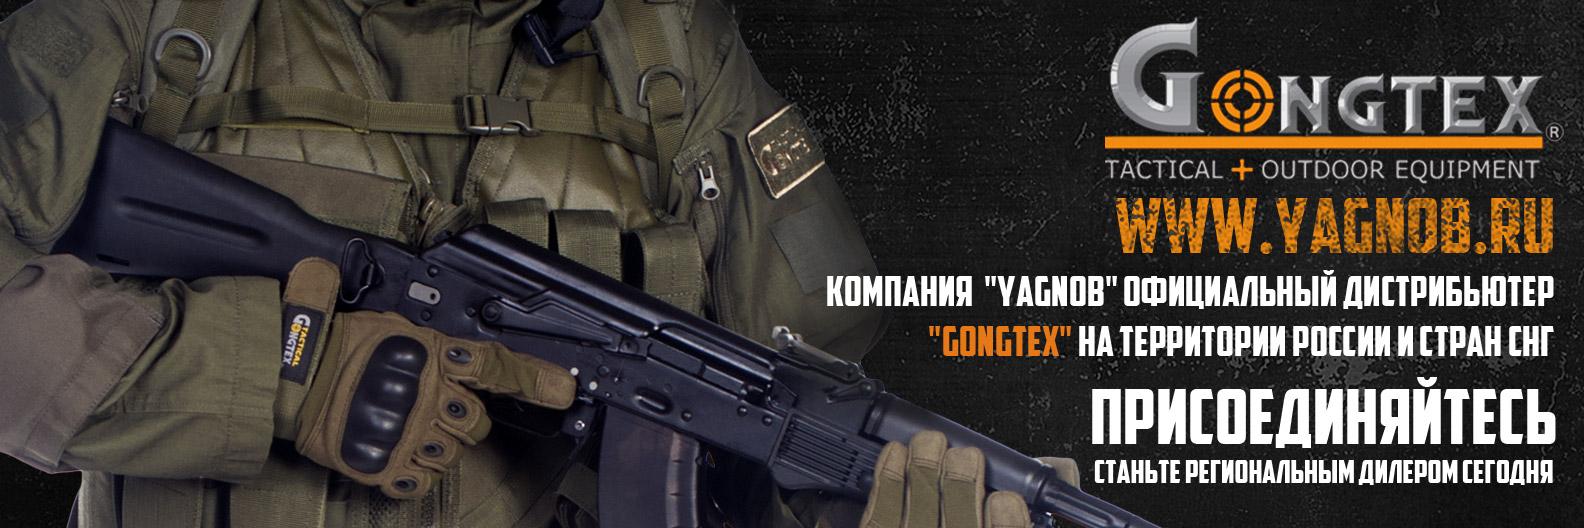 Продукция Gongtex по низким ценам!